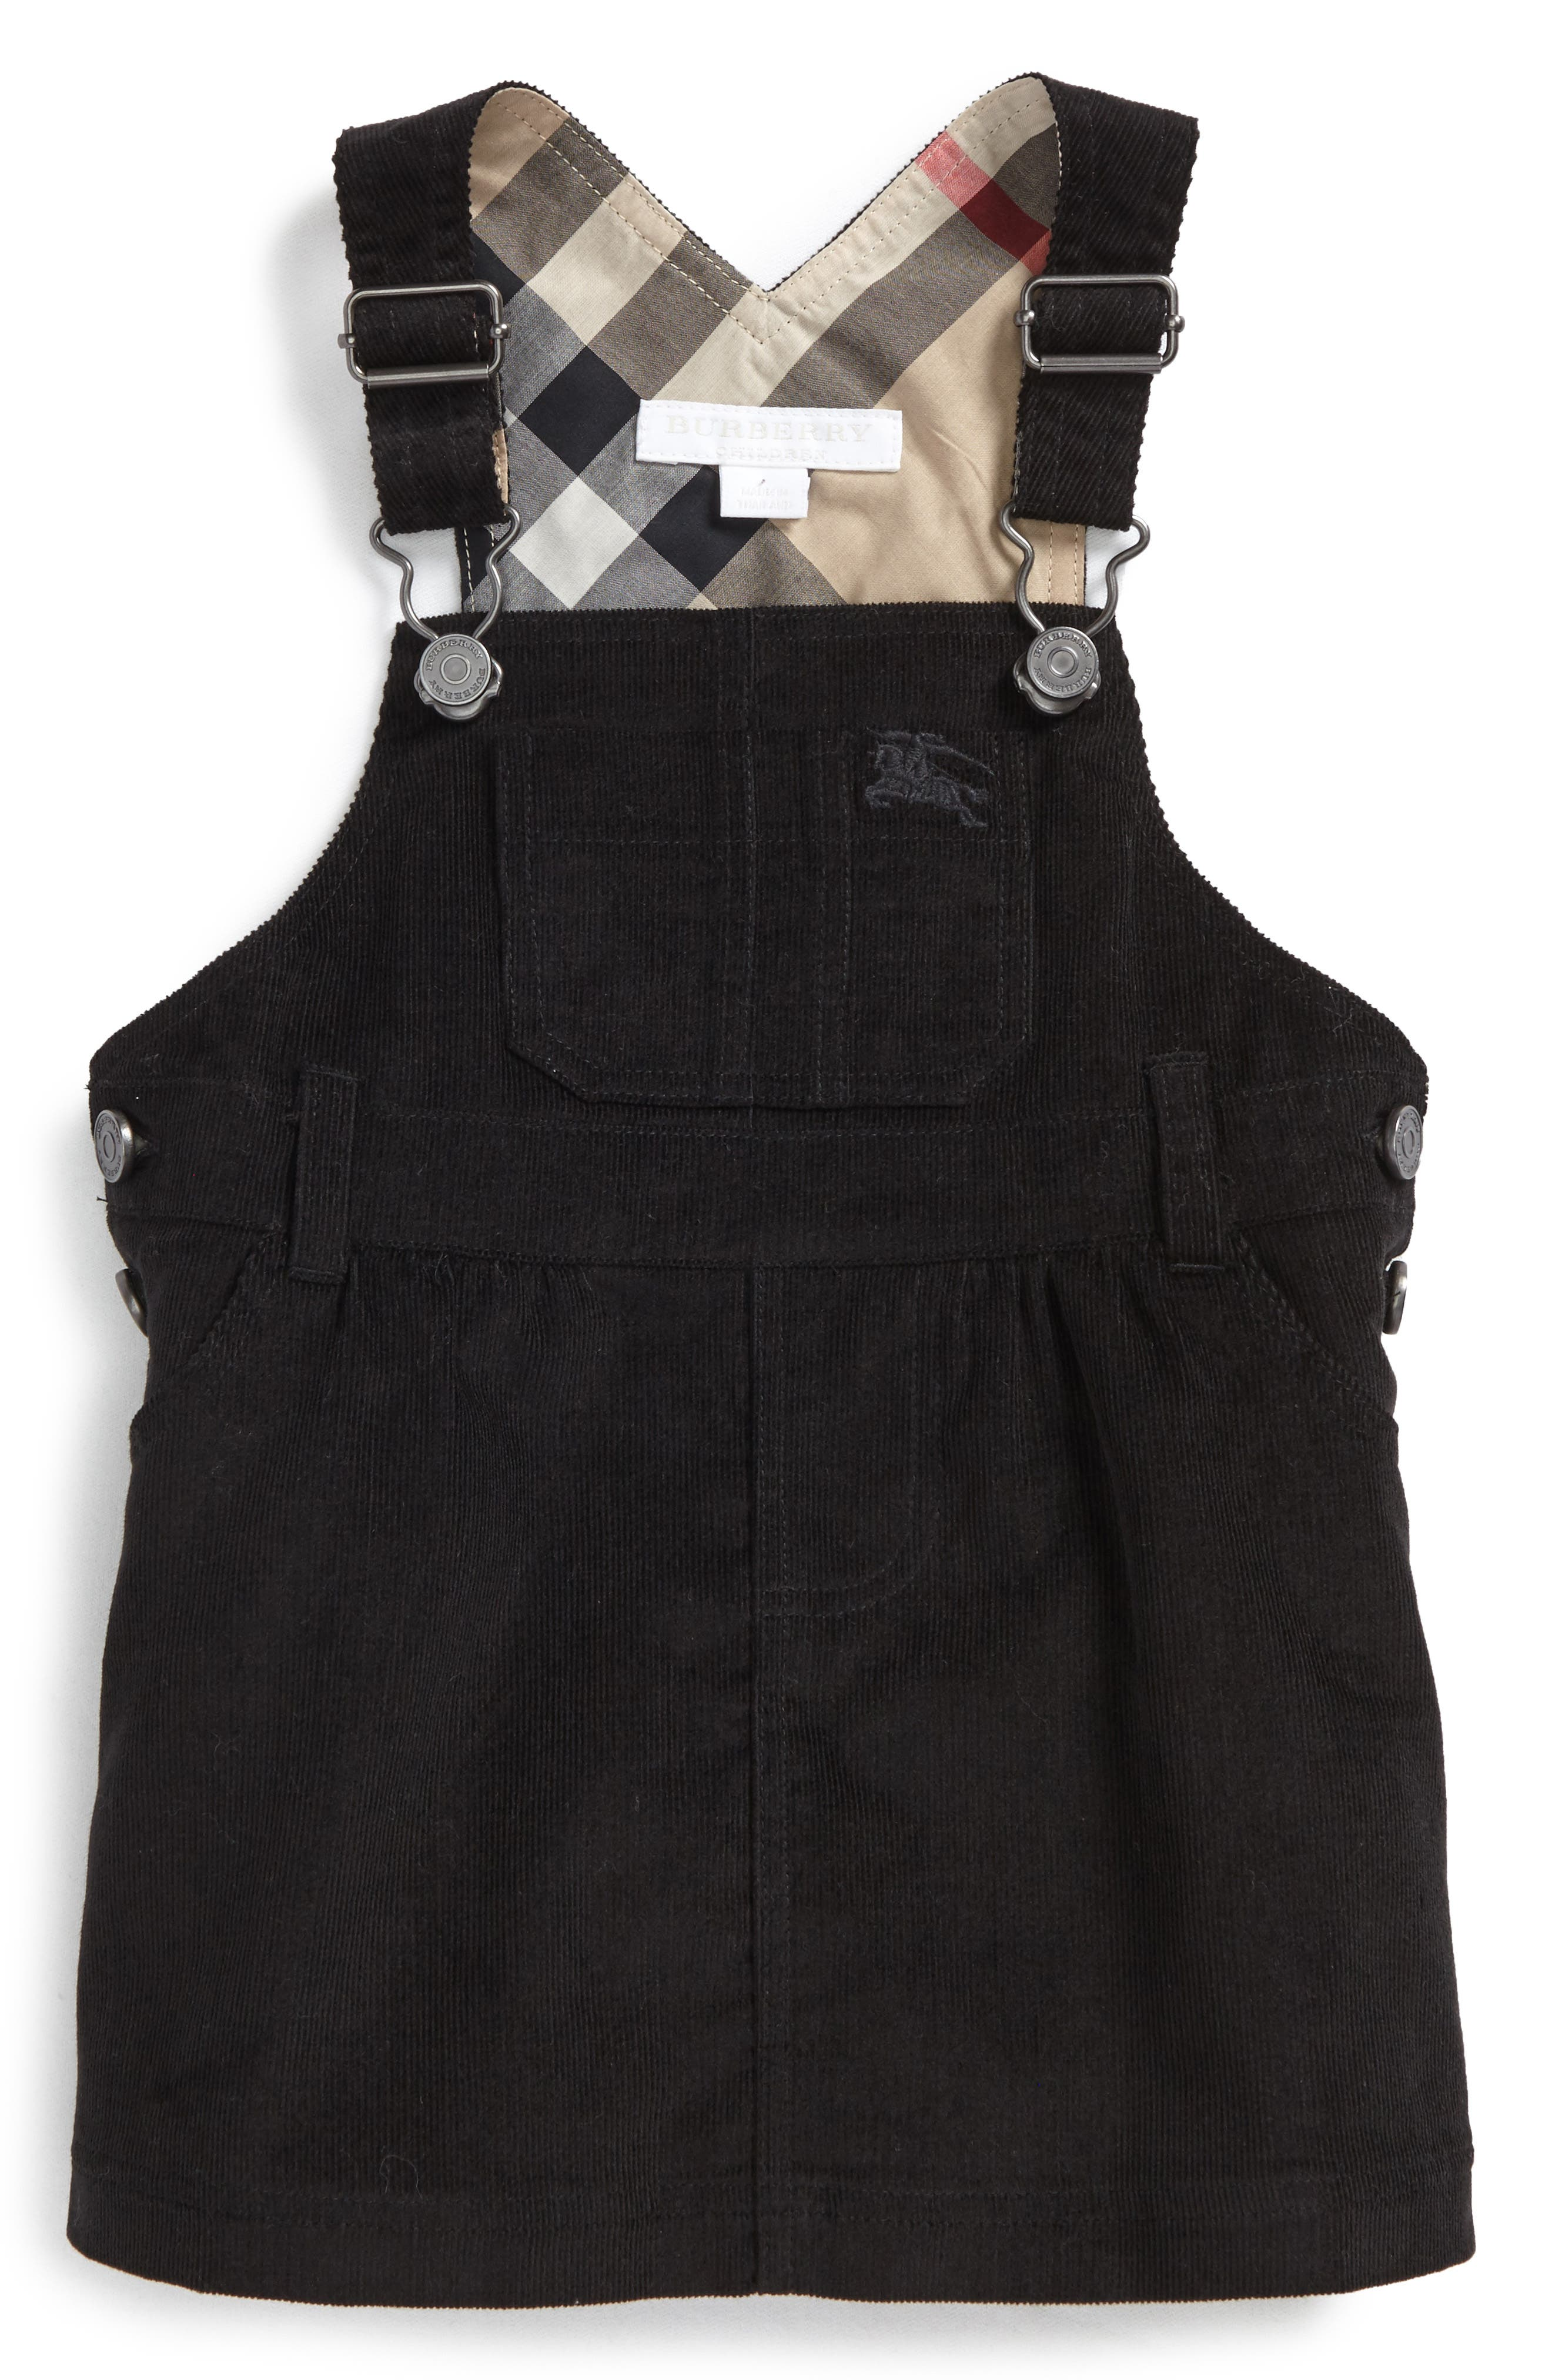 Burberry Wilma Overalls Dress (Baby Girl)